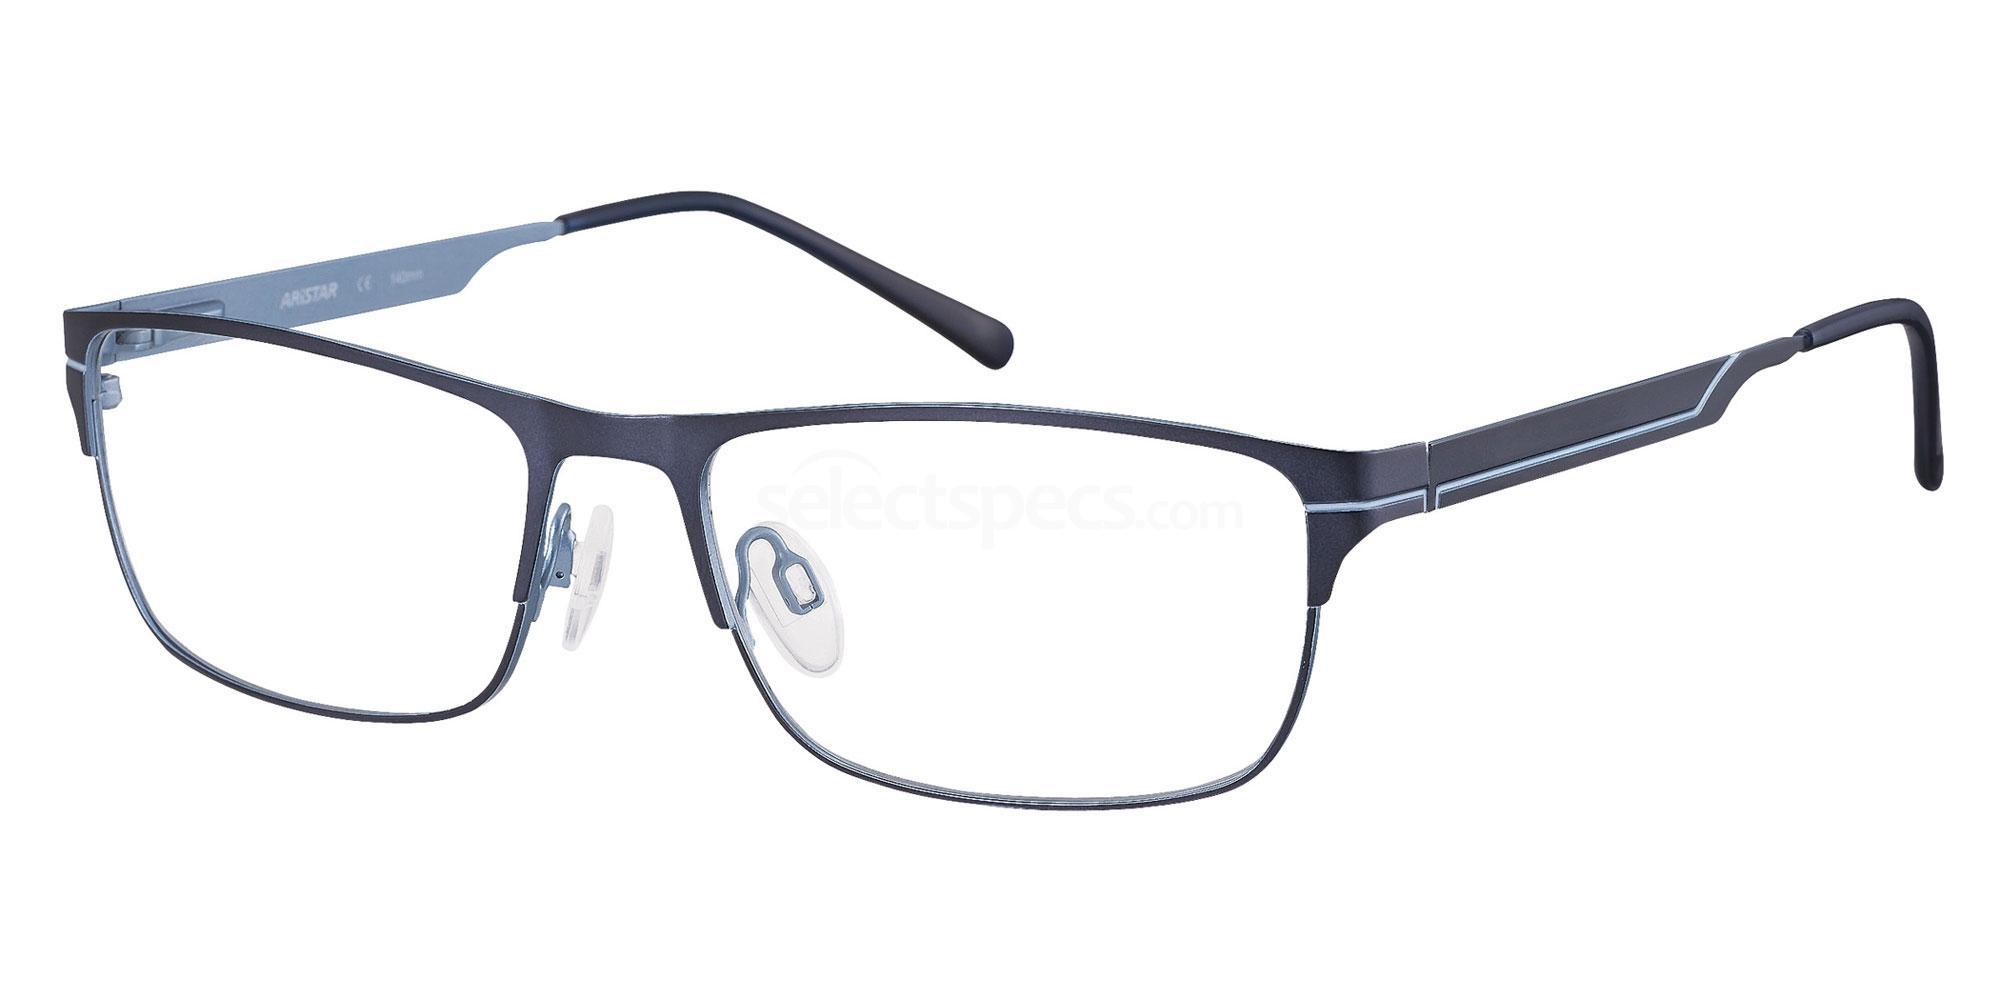 507 AR16238 Glasses, Aristar